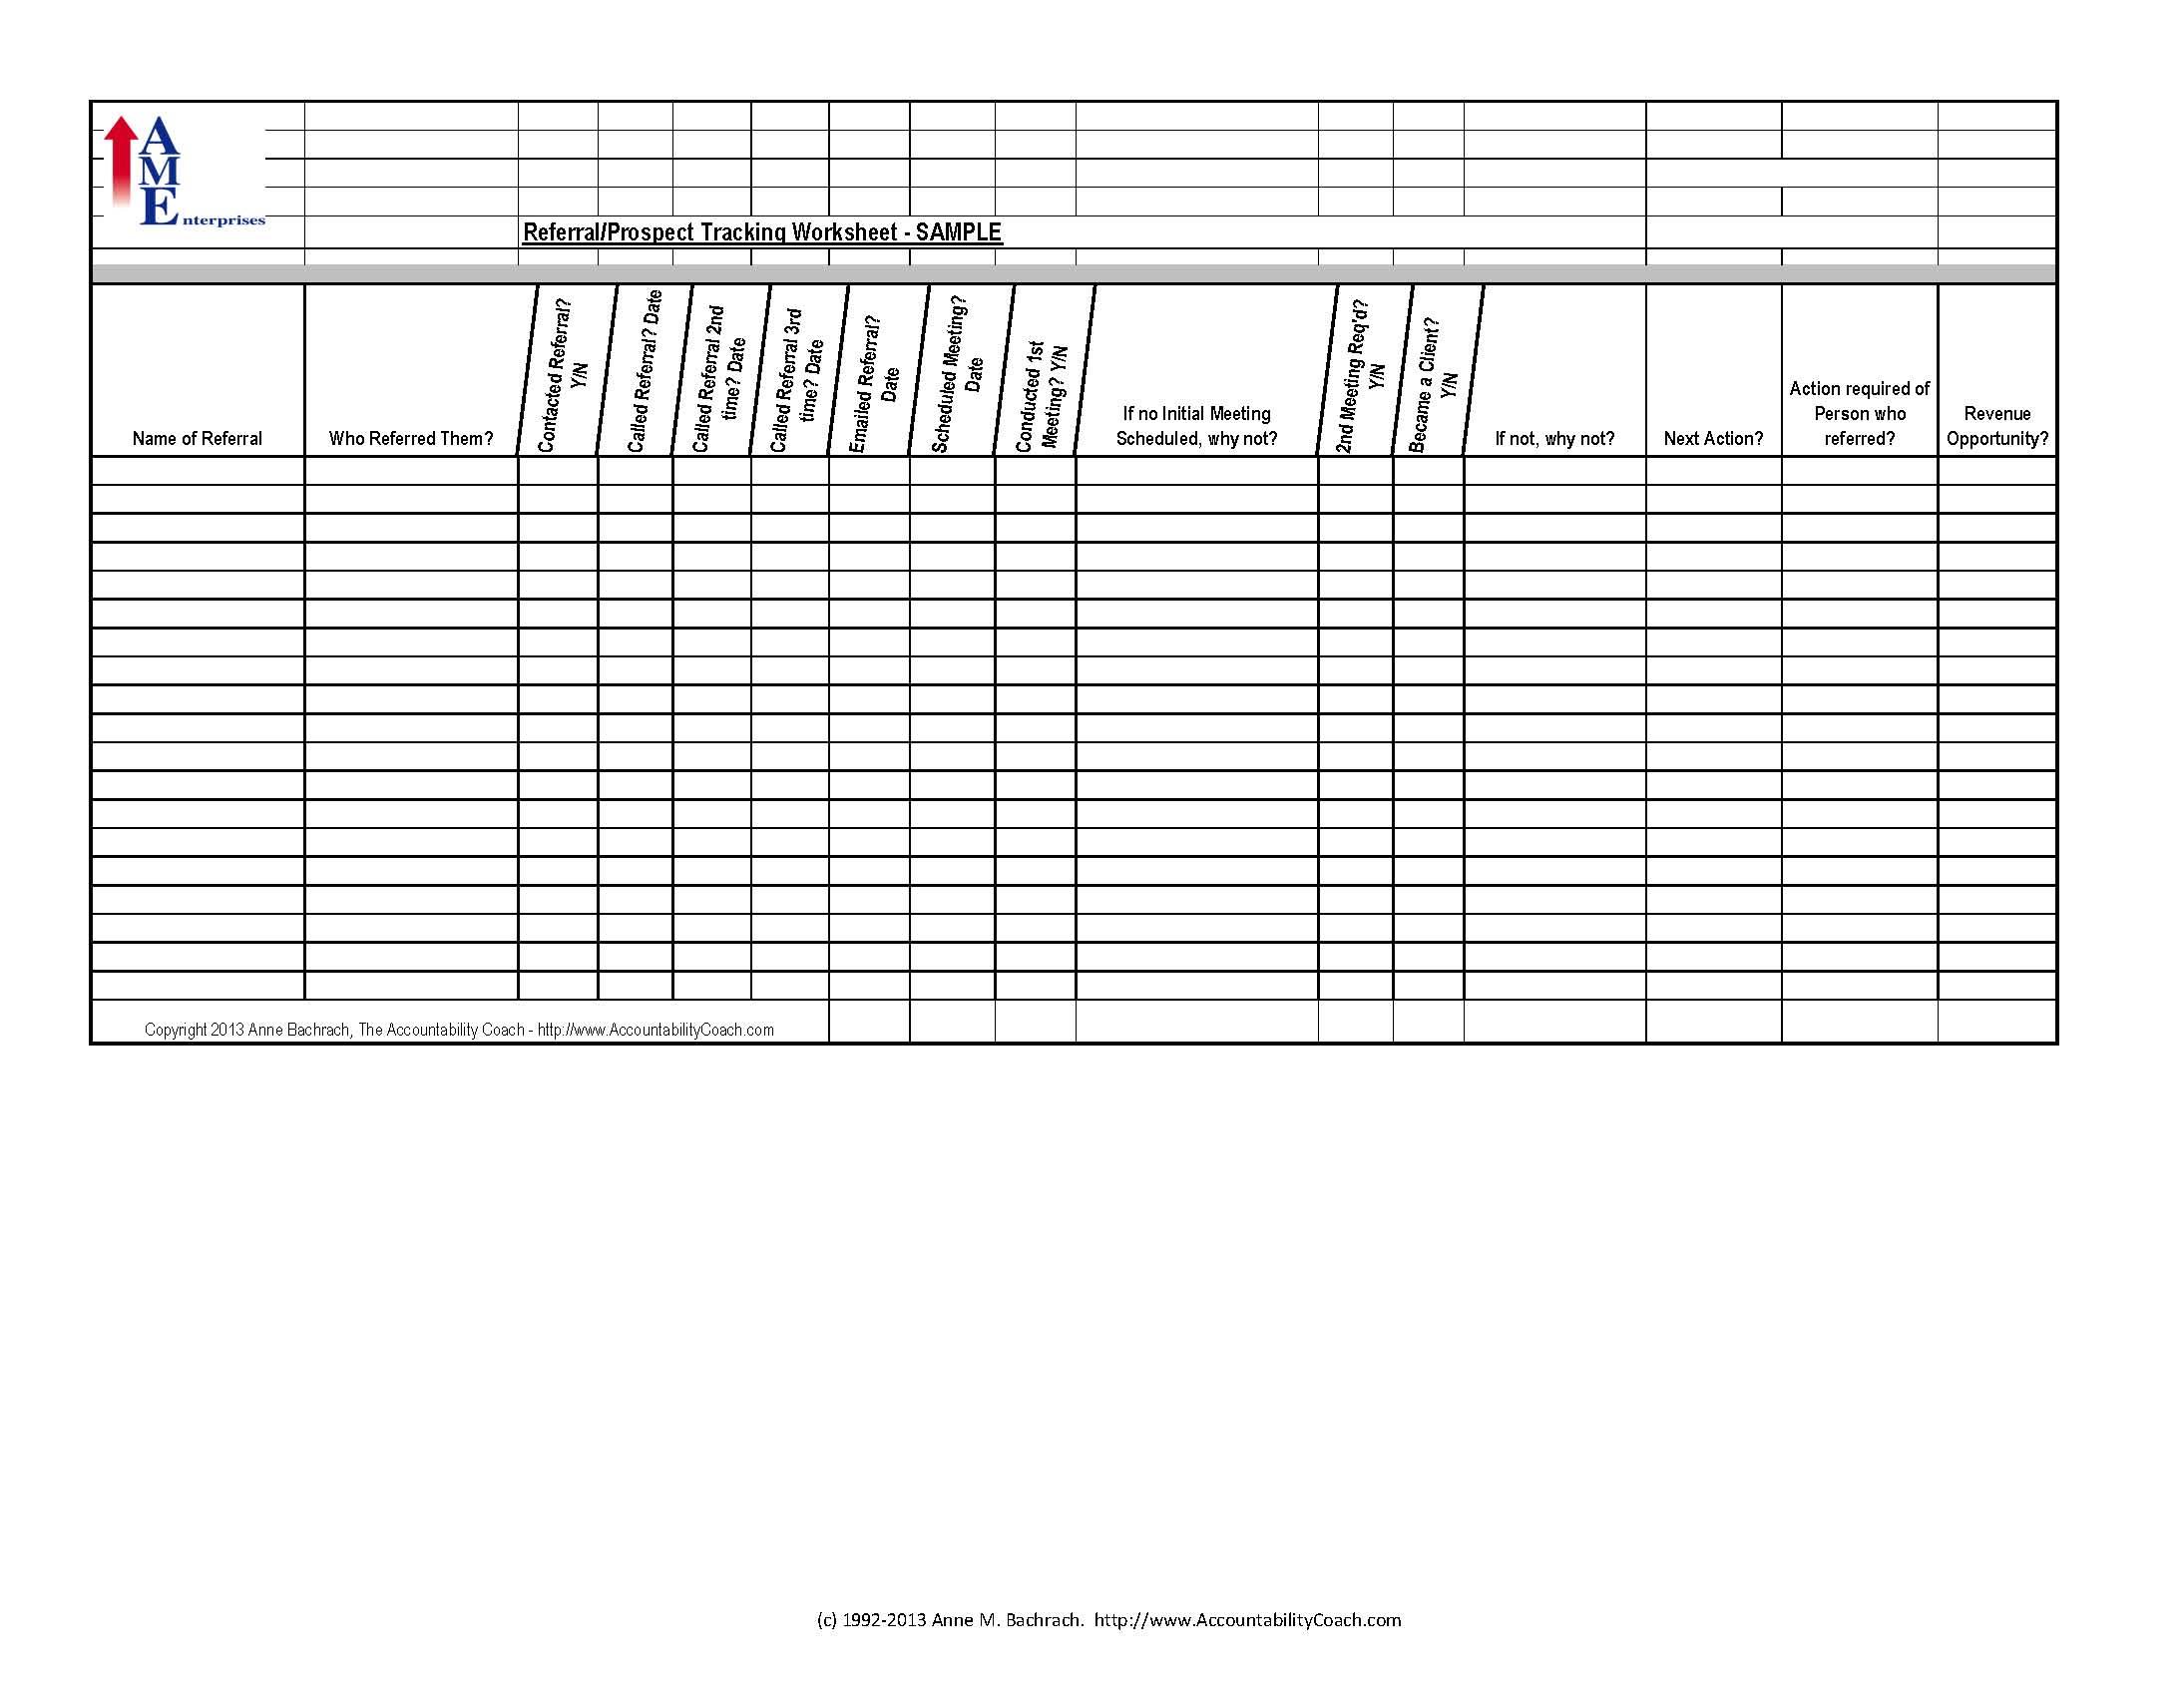 Customer Service Tracking Spreadsheet Regarding Free Tracking Spreadsheet  The Accountability Coachtm